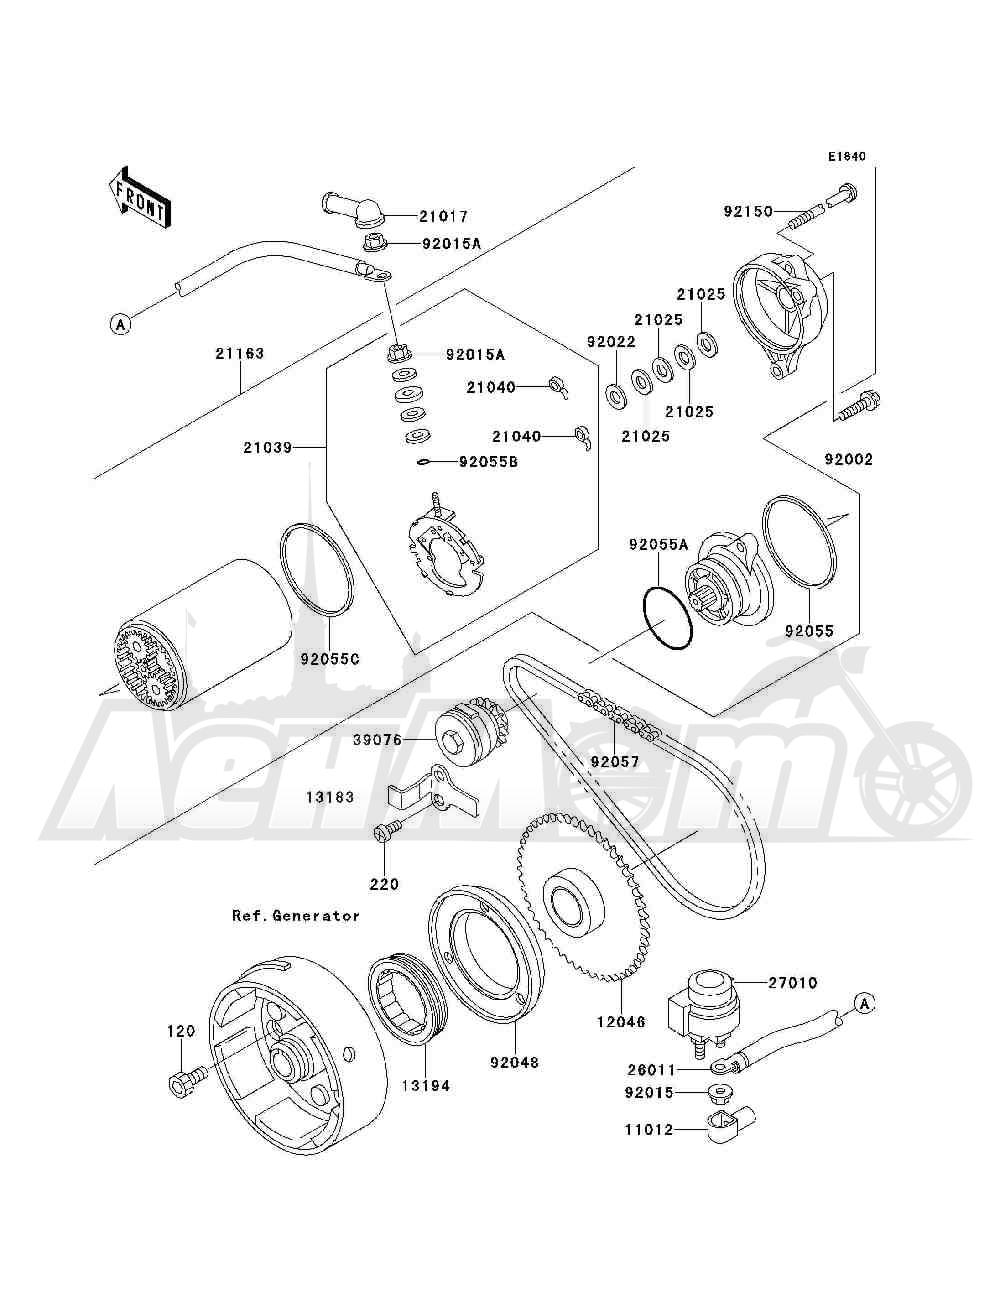 Запчасти для Квадроцикла Kawasaki 1993 BAYOU 300 4X4 (KLF300-C5) Раздел: STARTER MOTOR   электростартер